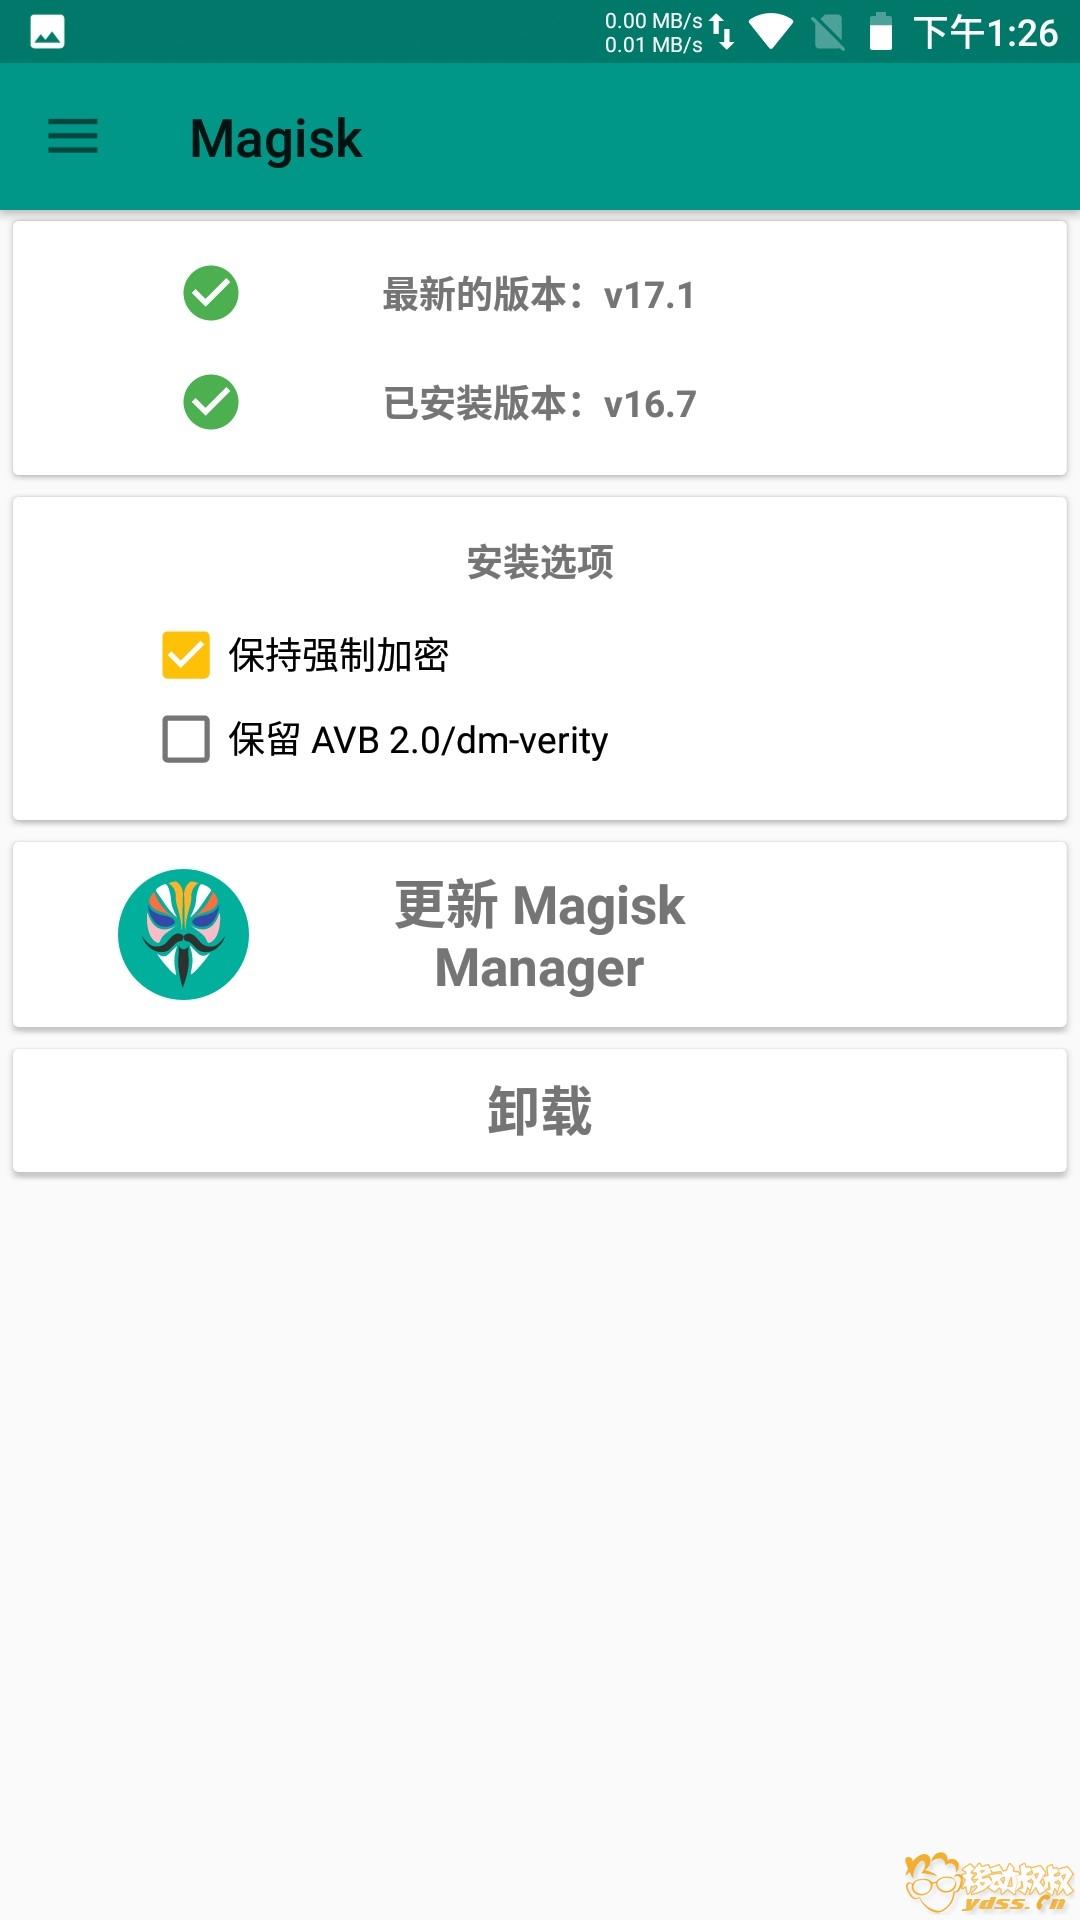 New0017Screenshot_Magisk_Manager_20180913-132648.jpg